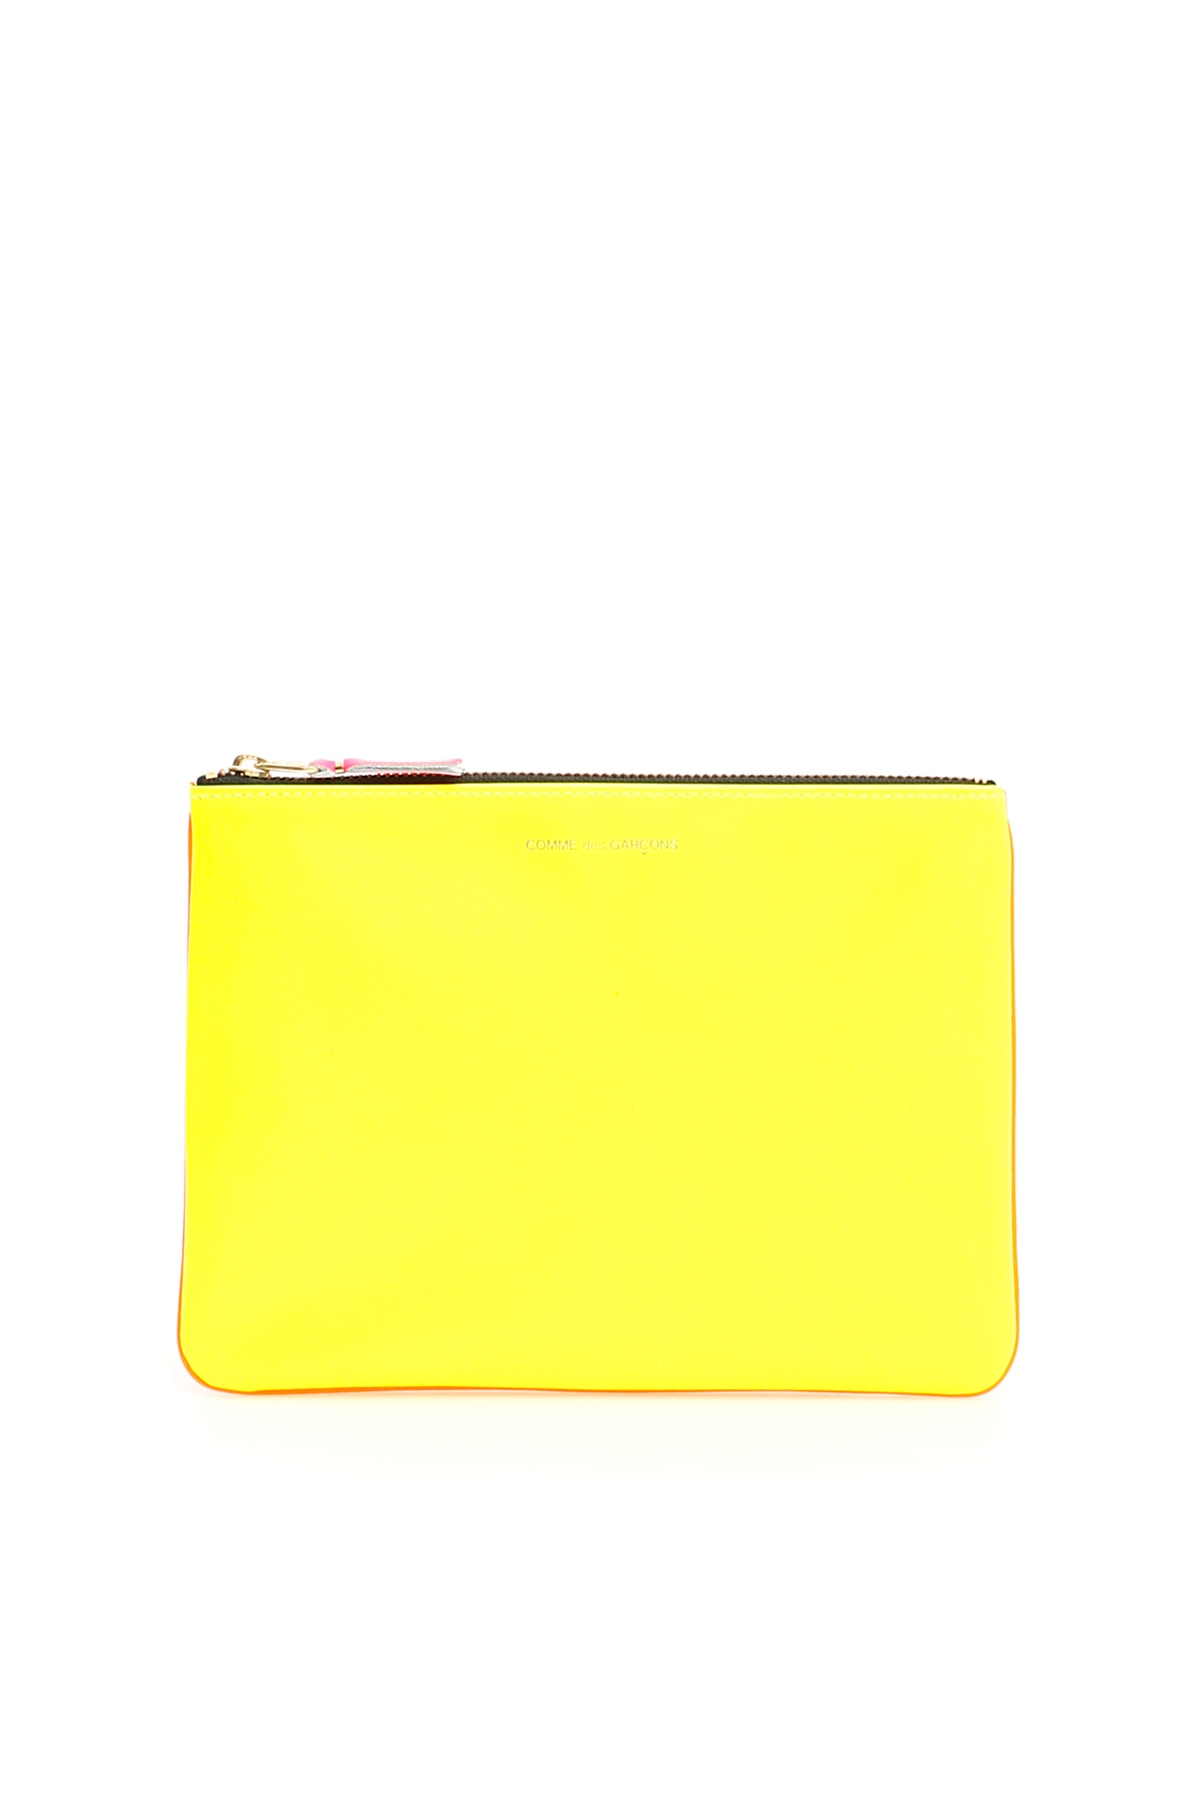 COMME DES GARCONS WALLET SUPER FLUO POUCH OS Yellow, Orange Leather